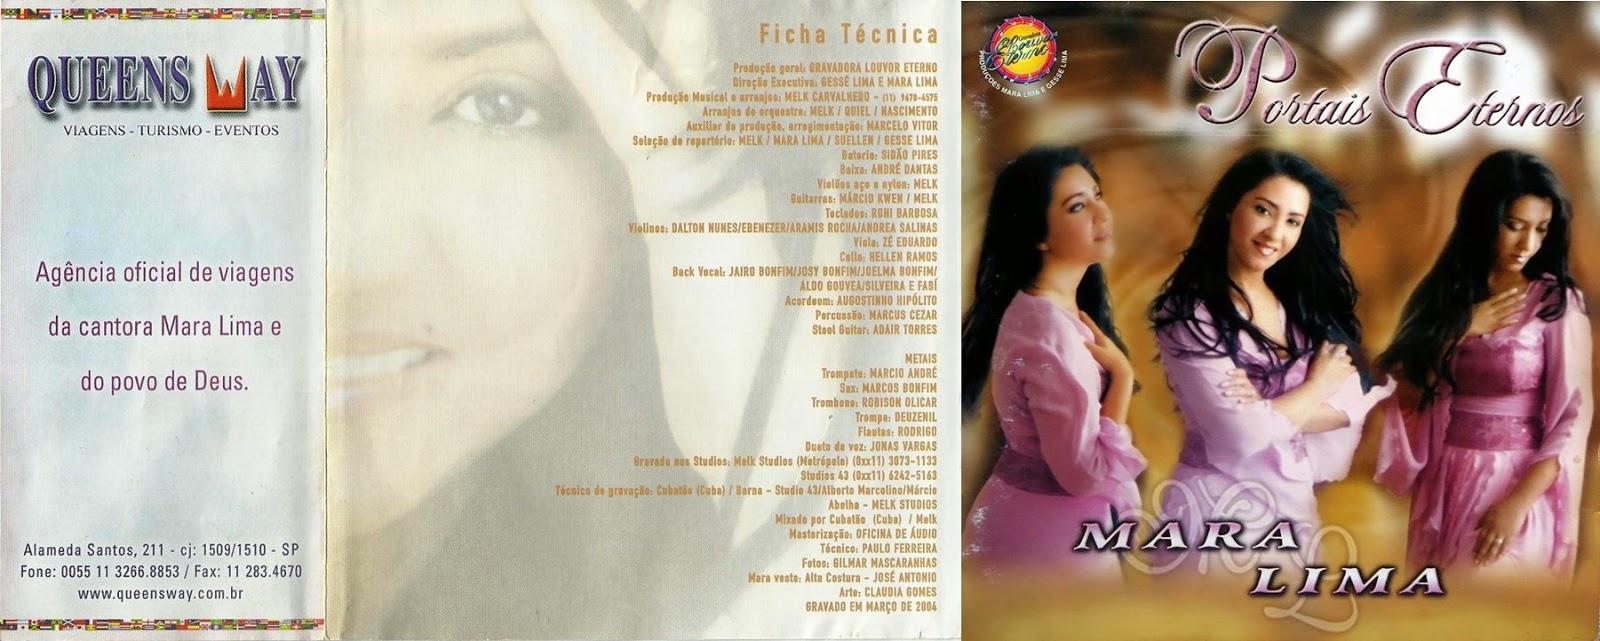 cd mara lima portais eternos playback